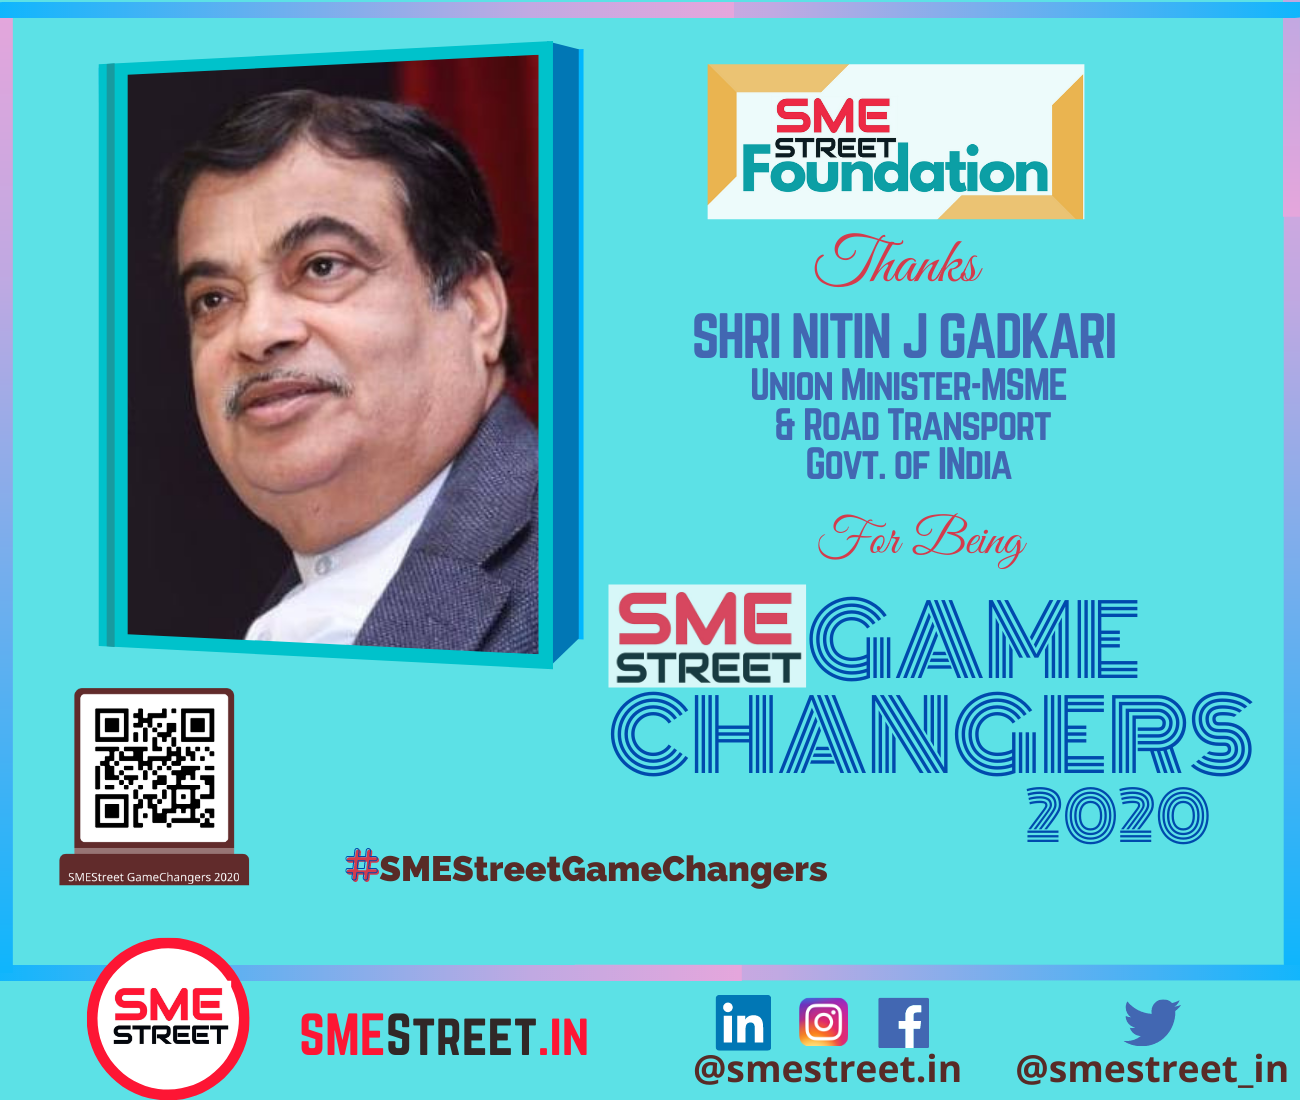 Nitin Gadkari as the SMEStreet GameChanger 2020